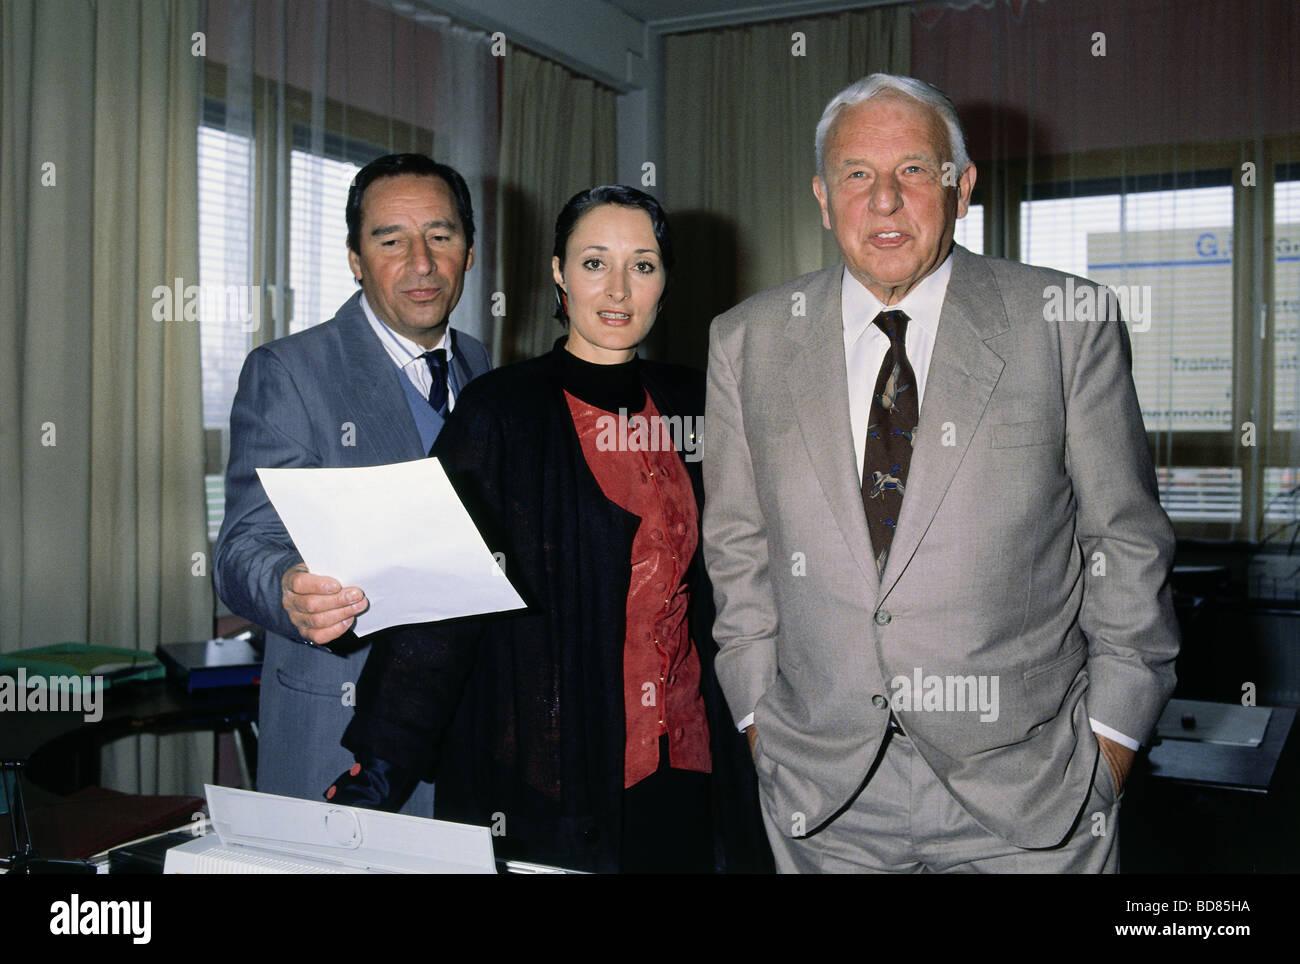 Tv Serie Buro Buro Deu 1982 1993 2 Saison 1989 Szene Mit